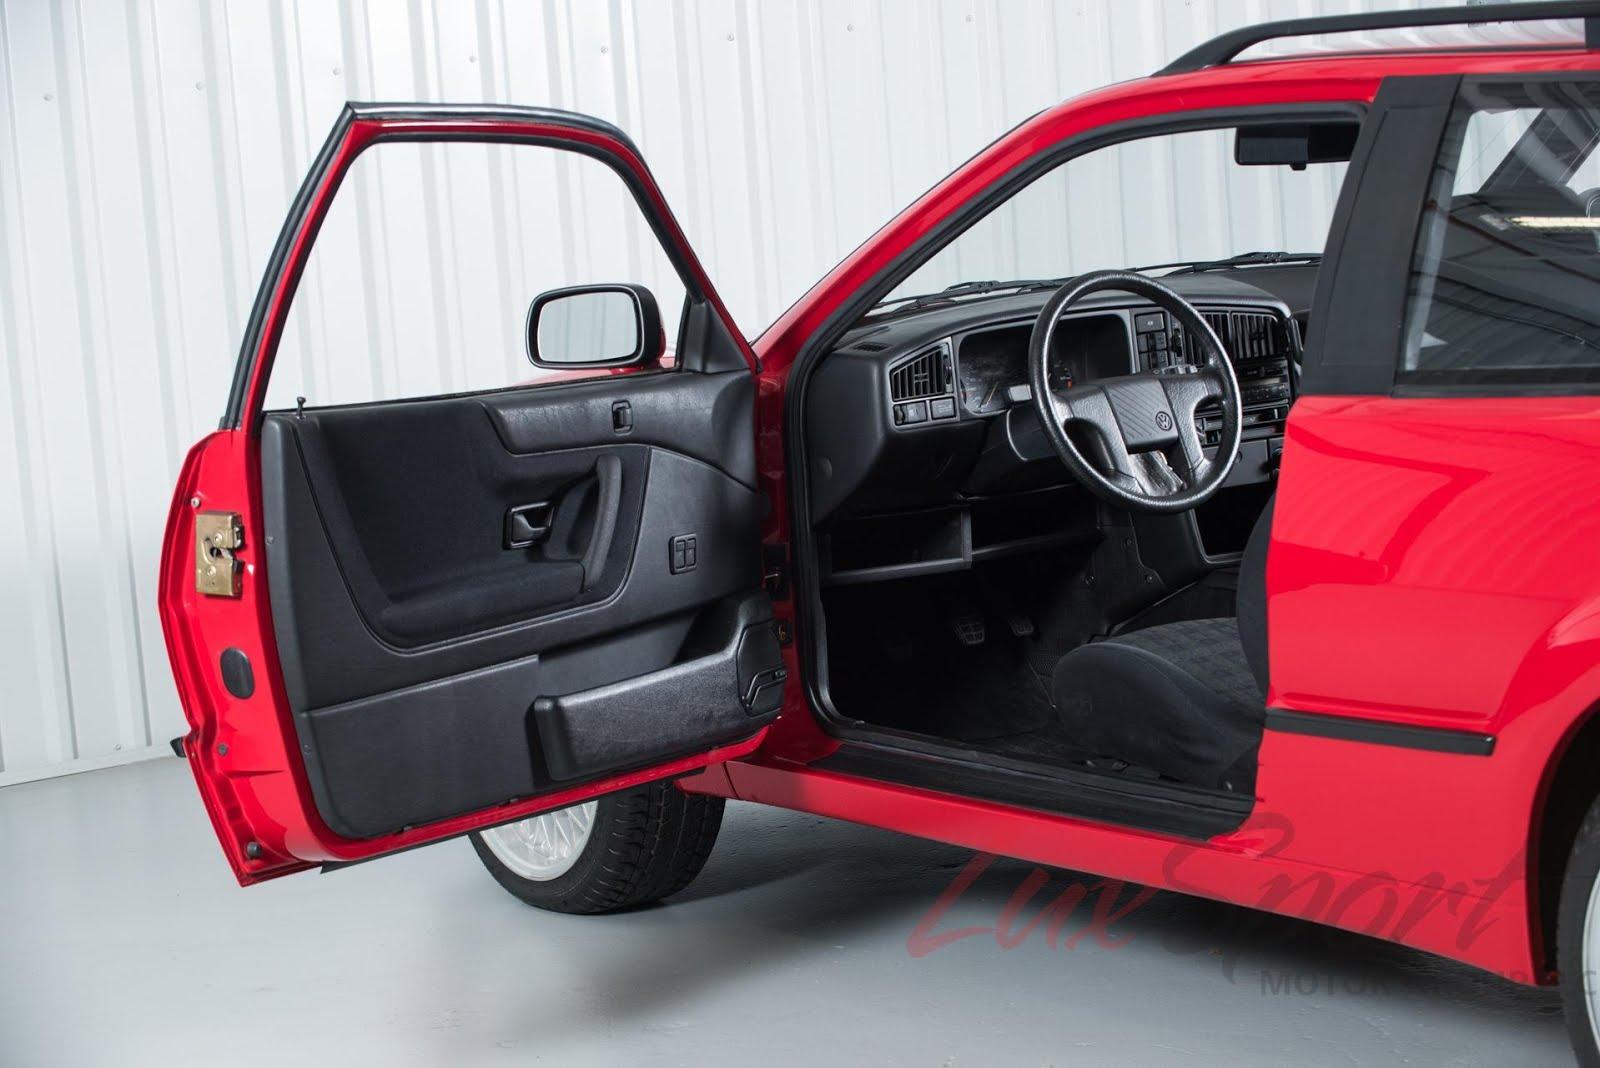 1990 Vw Corrado G60 Magnum Prototype Wagon For Sale